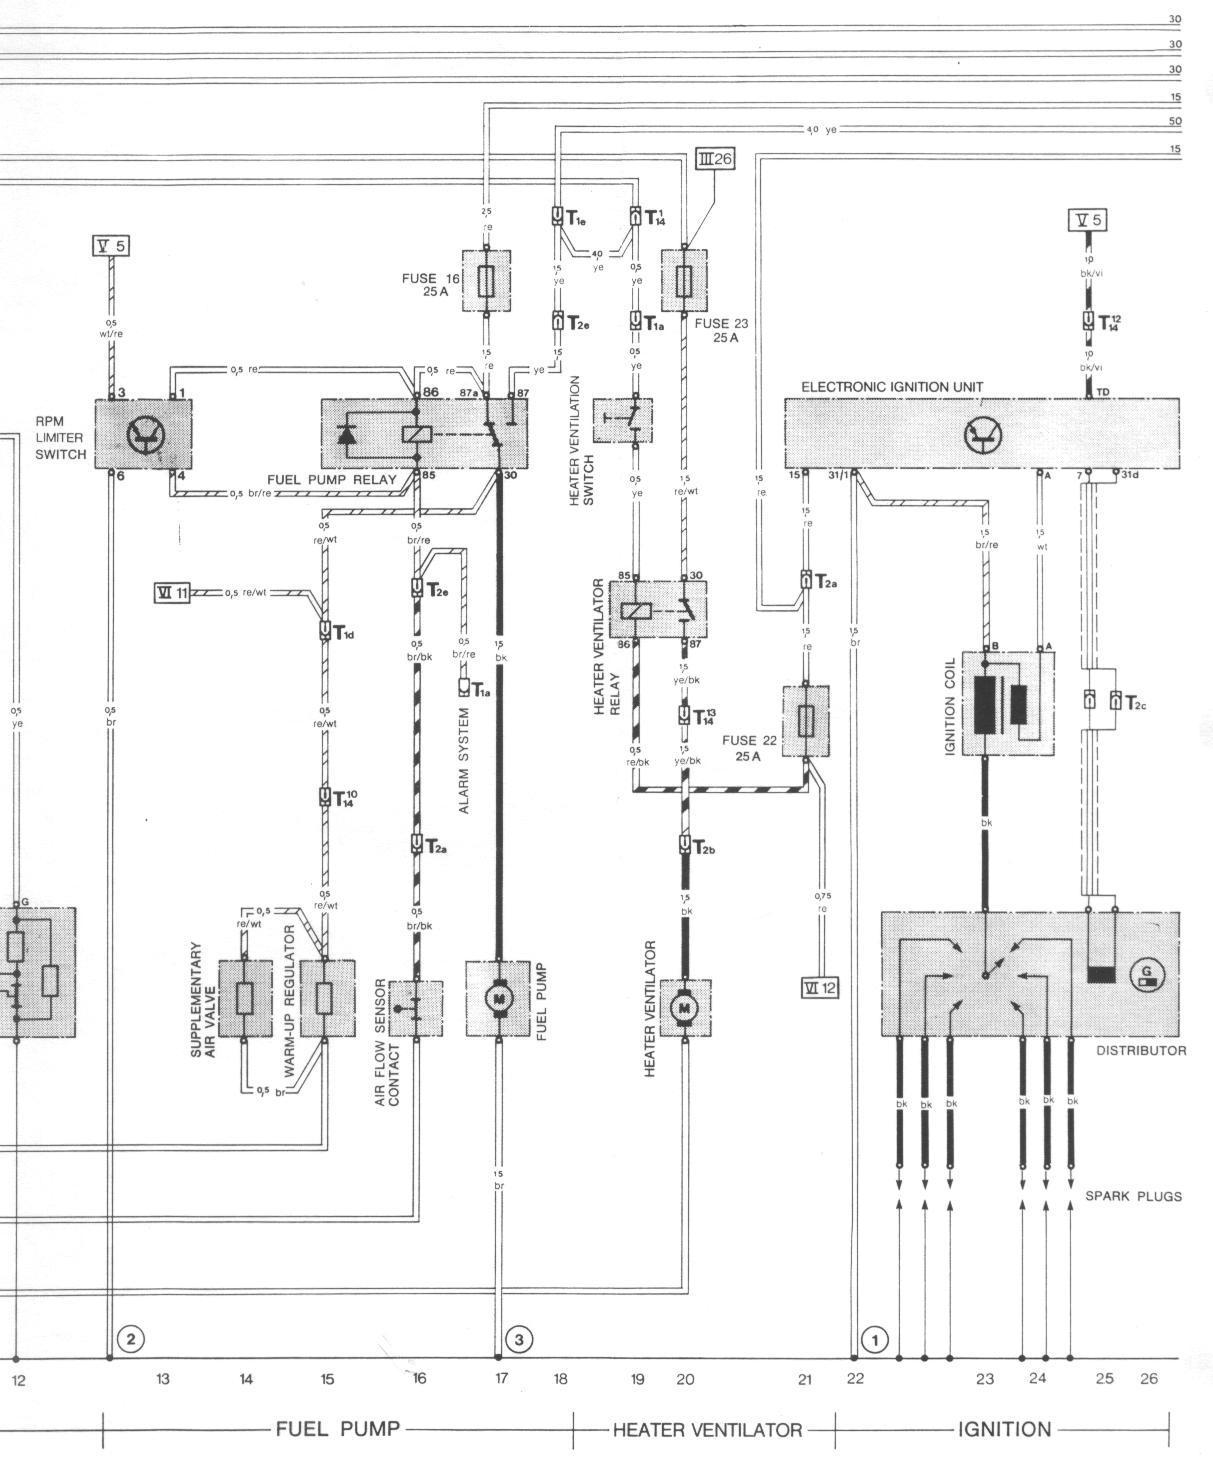 hight resolution of 1976 porsche wiring diagram wiring libraryporsche 911 3 2 fuse box electrical wiring diagrams 1976 porsche